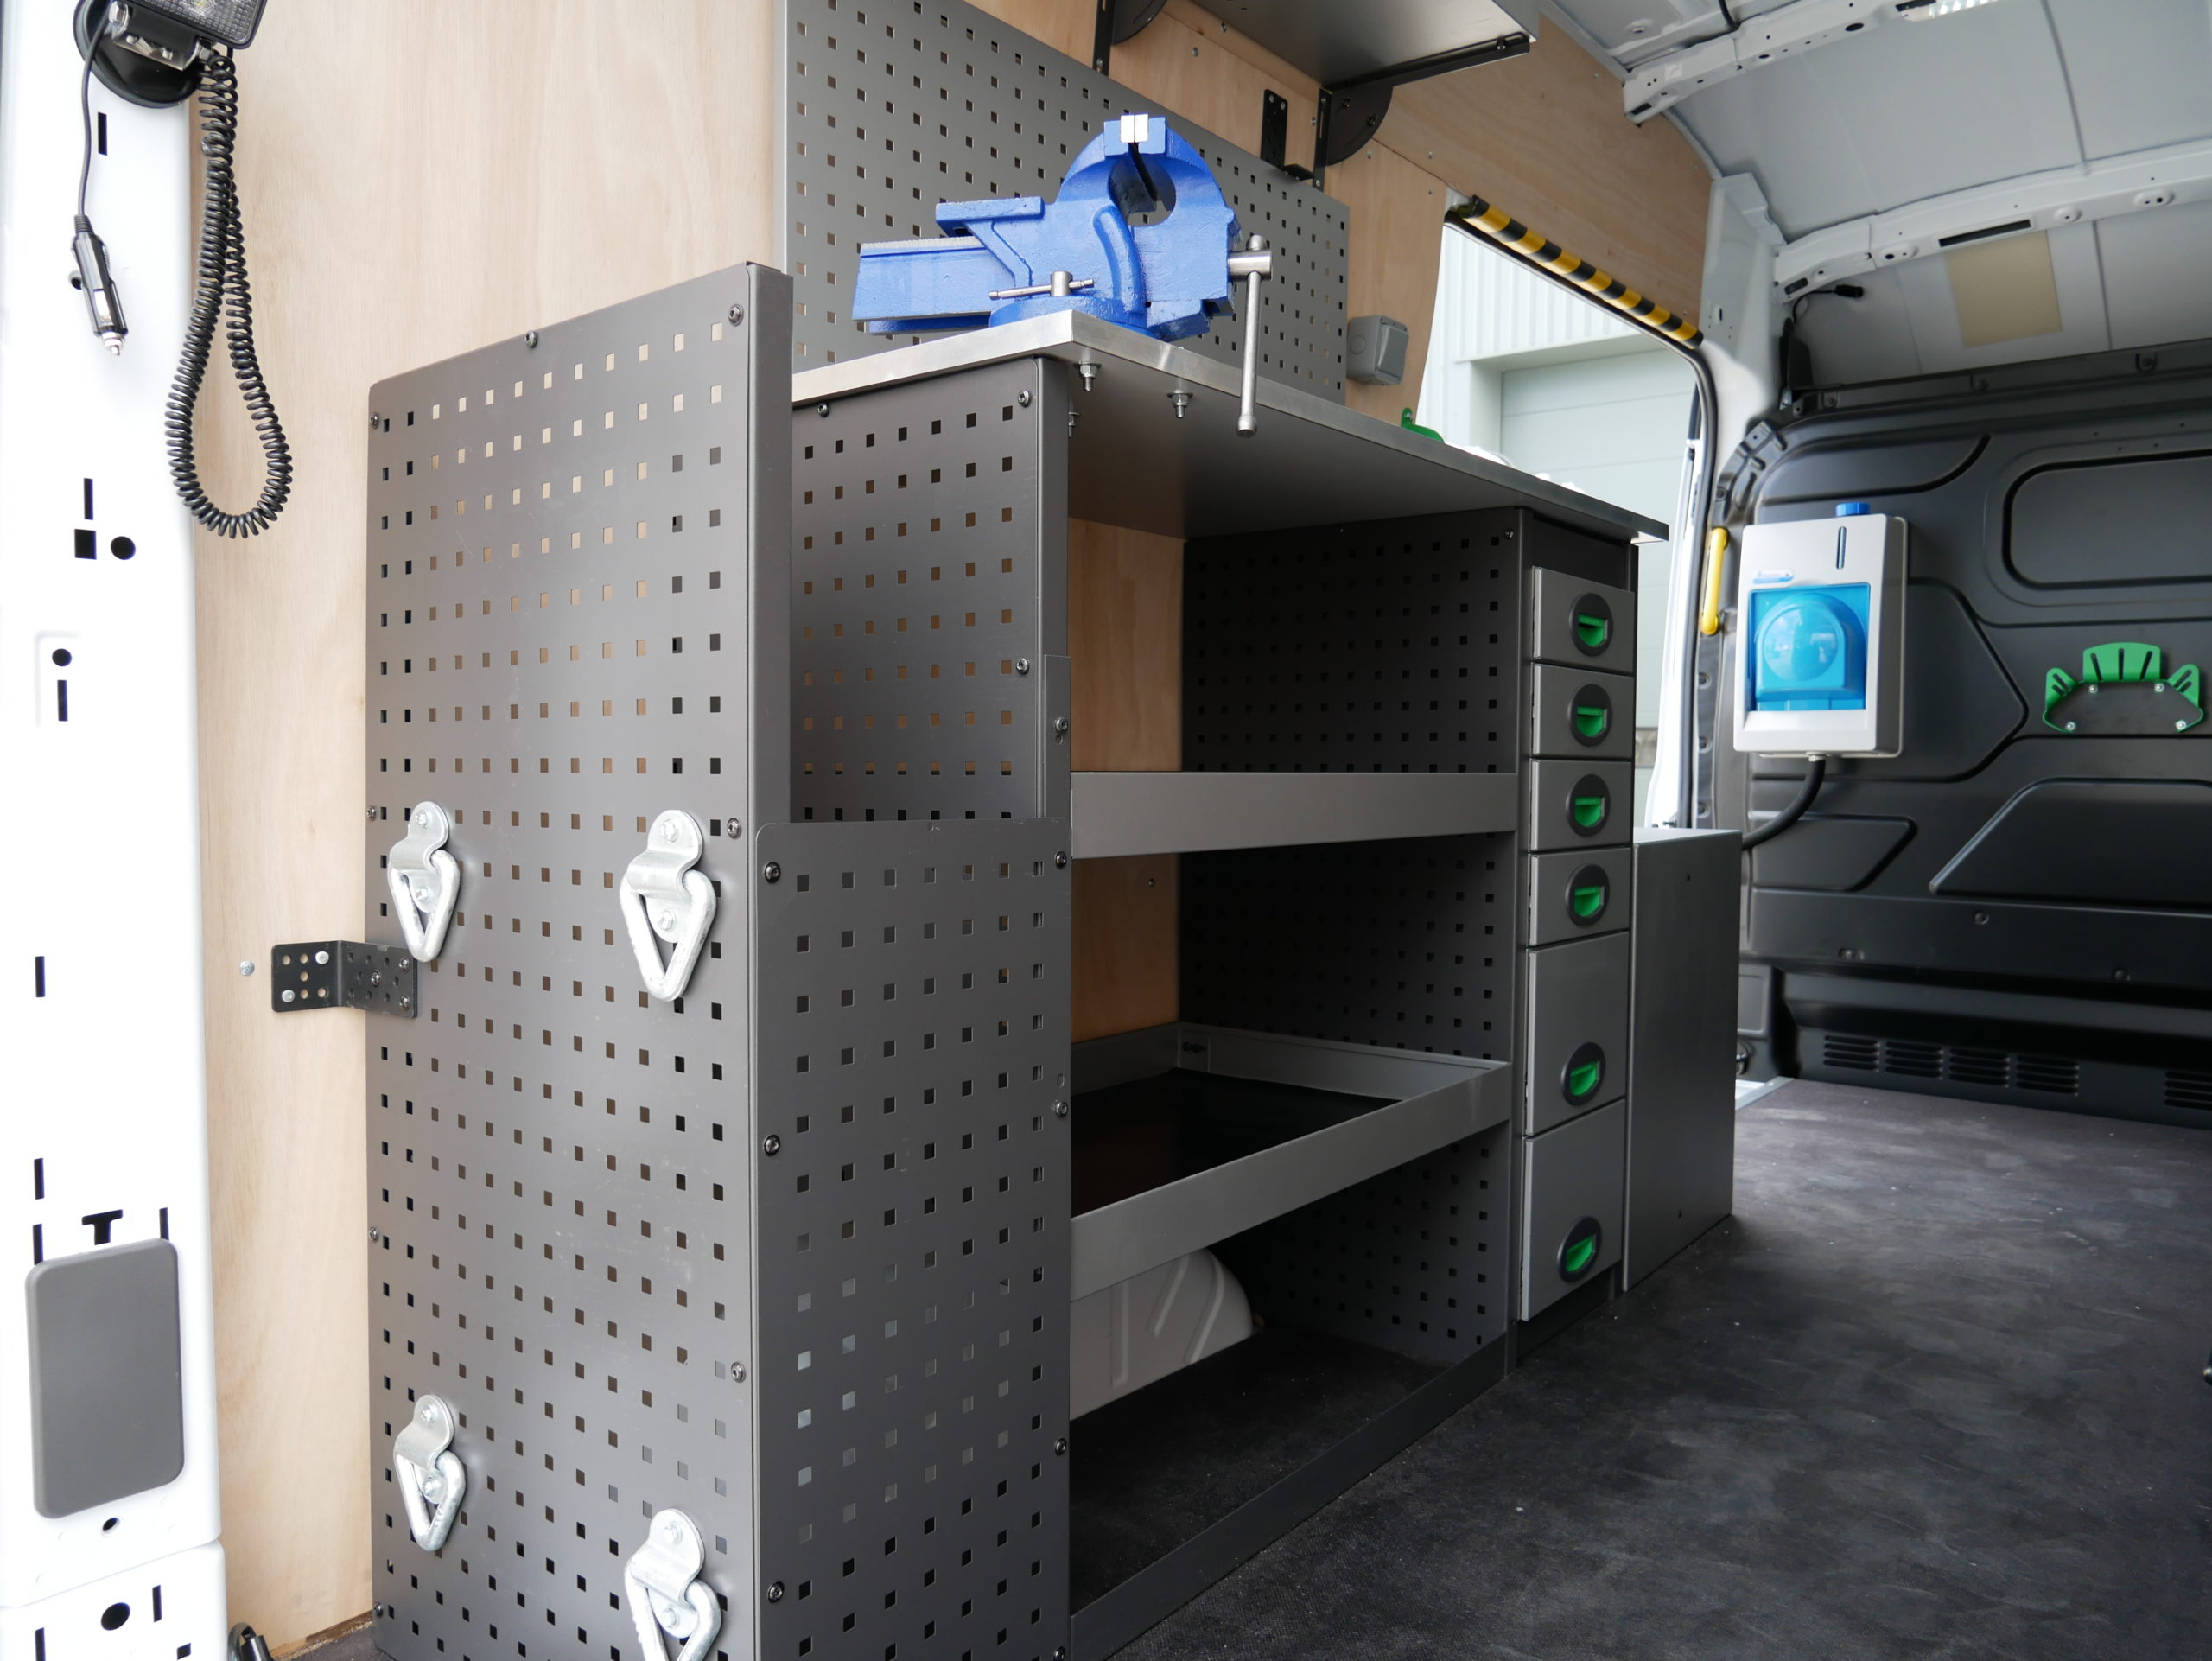 Harlaxton Engineering Mobile Service Van Conversion for Utilities Installer